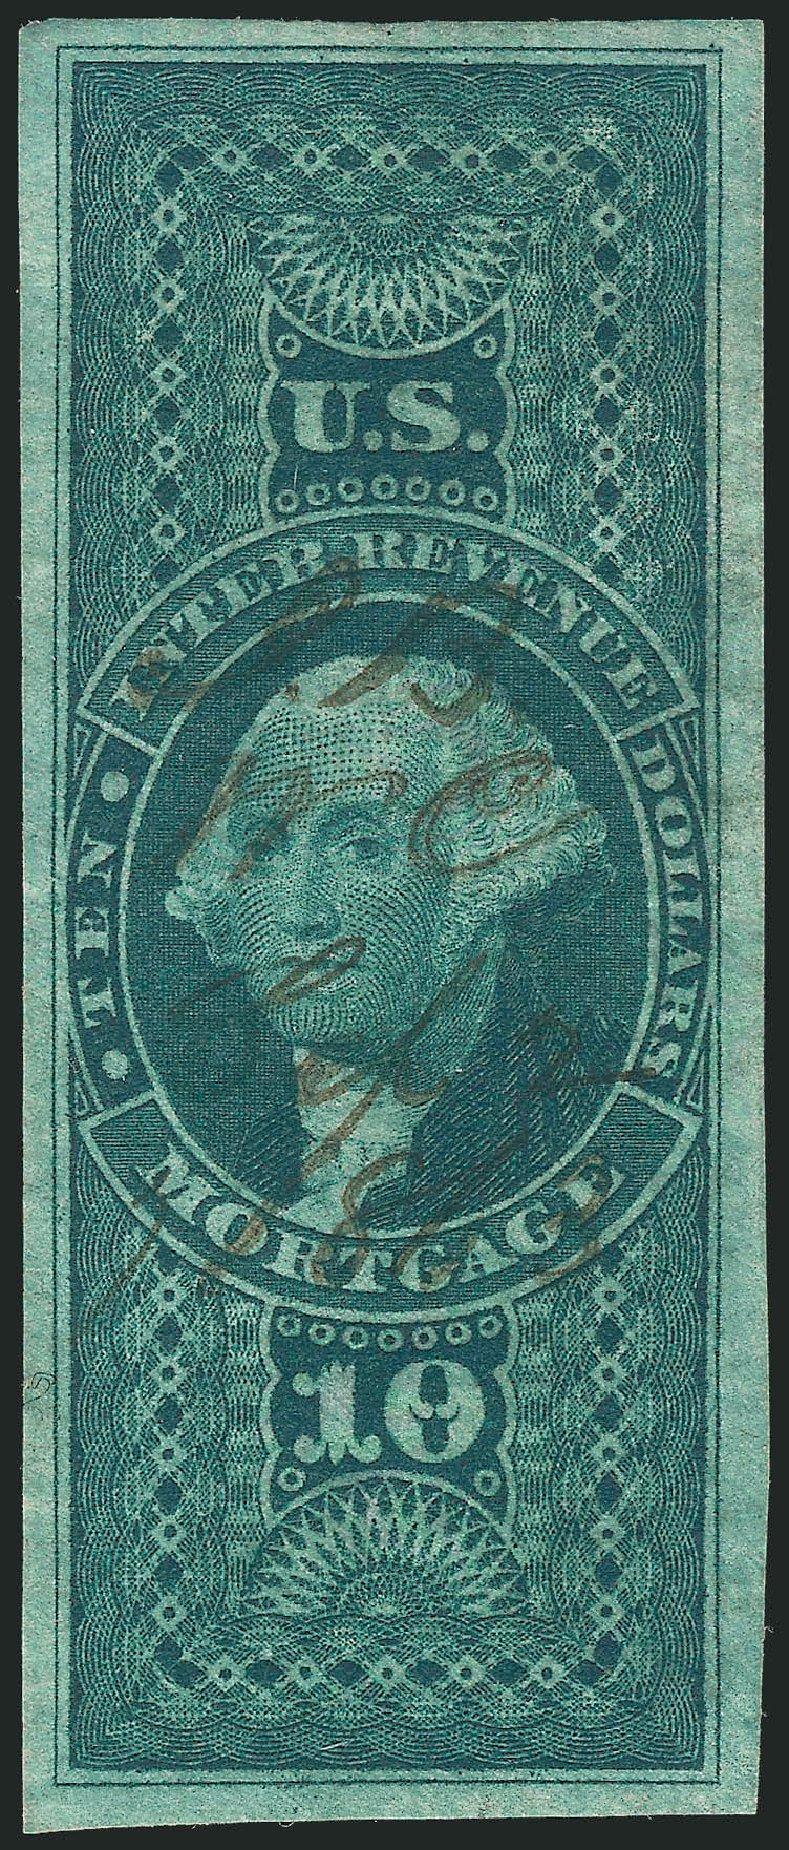 Prices of US Stamp Scott Catalogue # R95 - 1862 US$10.00 Revenue Mortgage. Robert Siegel Auction Galleries, Mar 2014, Sale 1067, Lot 538